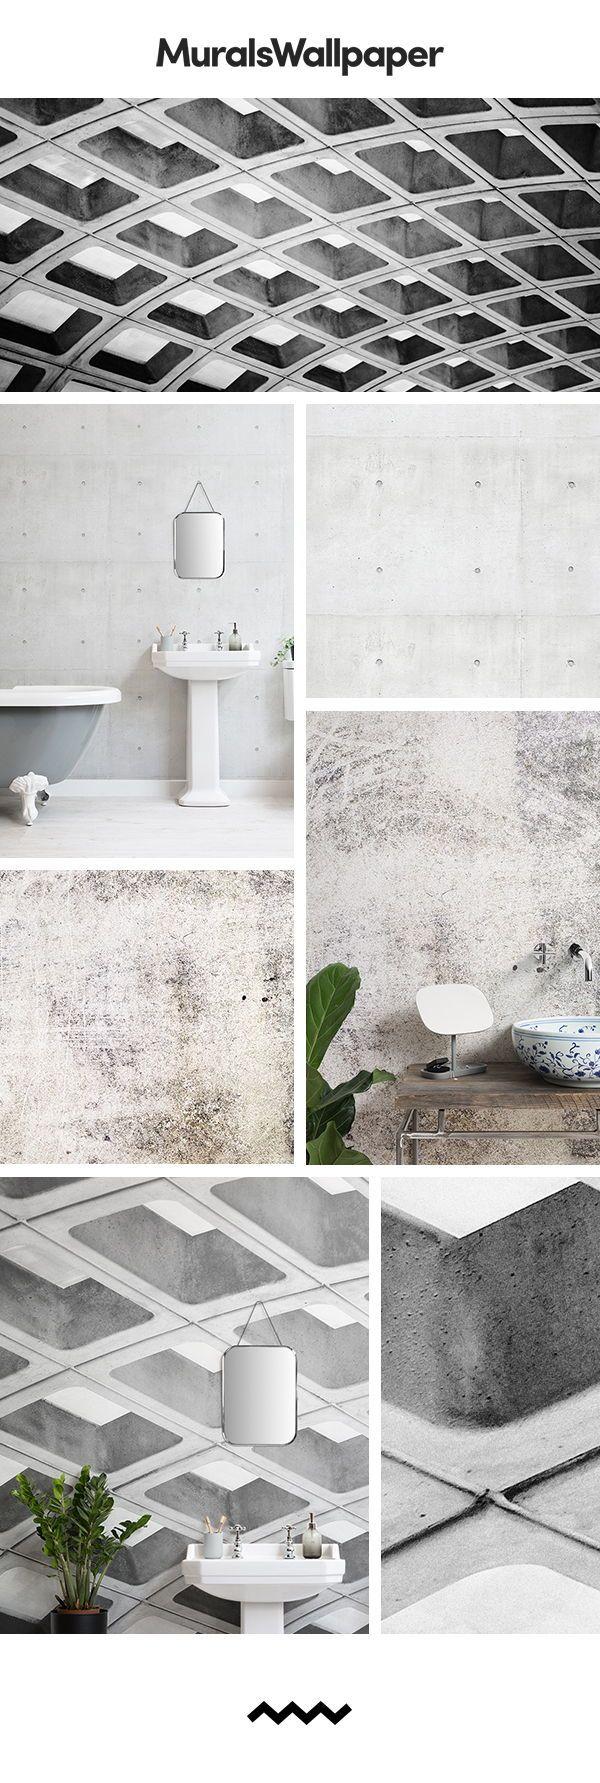 grau bauernhof badezimmer ideen mit rustikaler beton. Black Bedroom Furniture Sets. Home Design Ideas